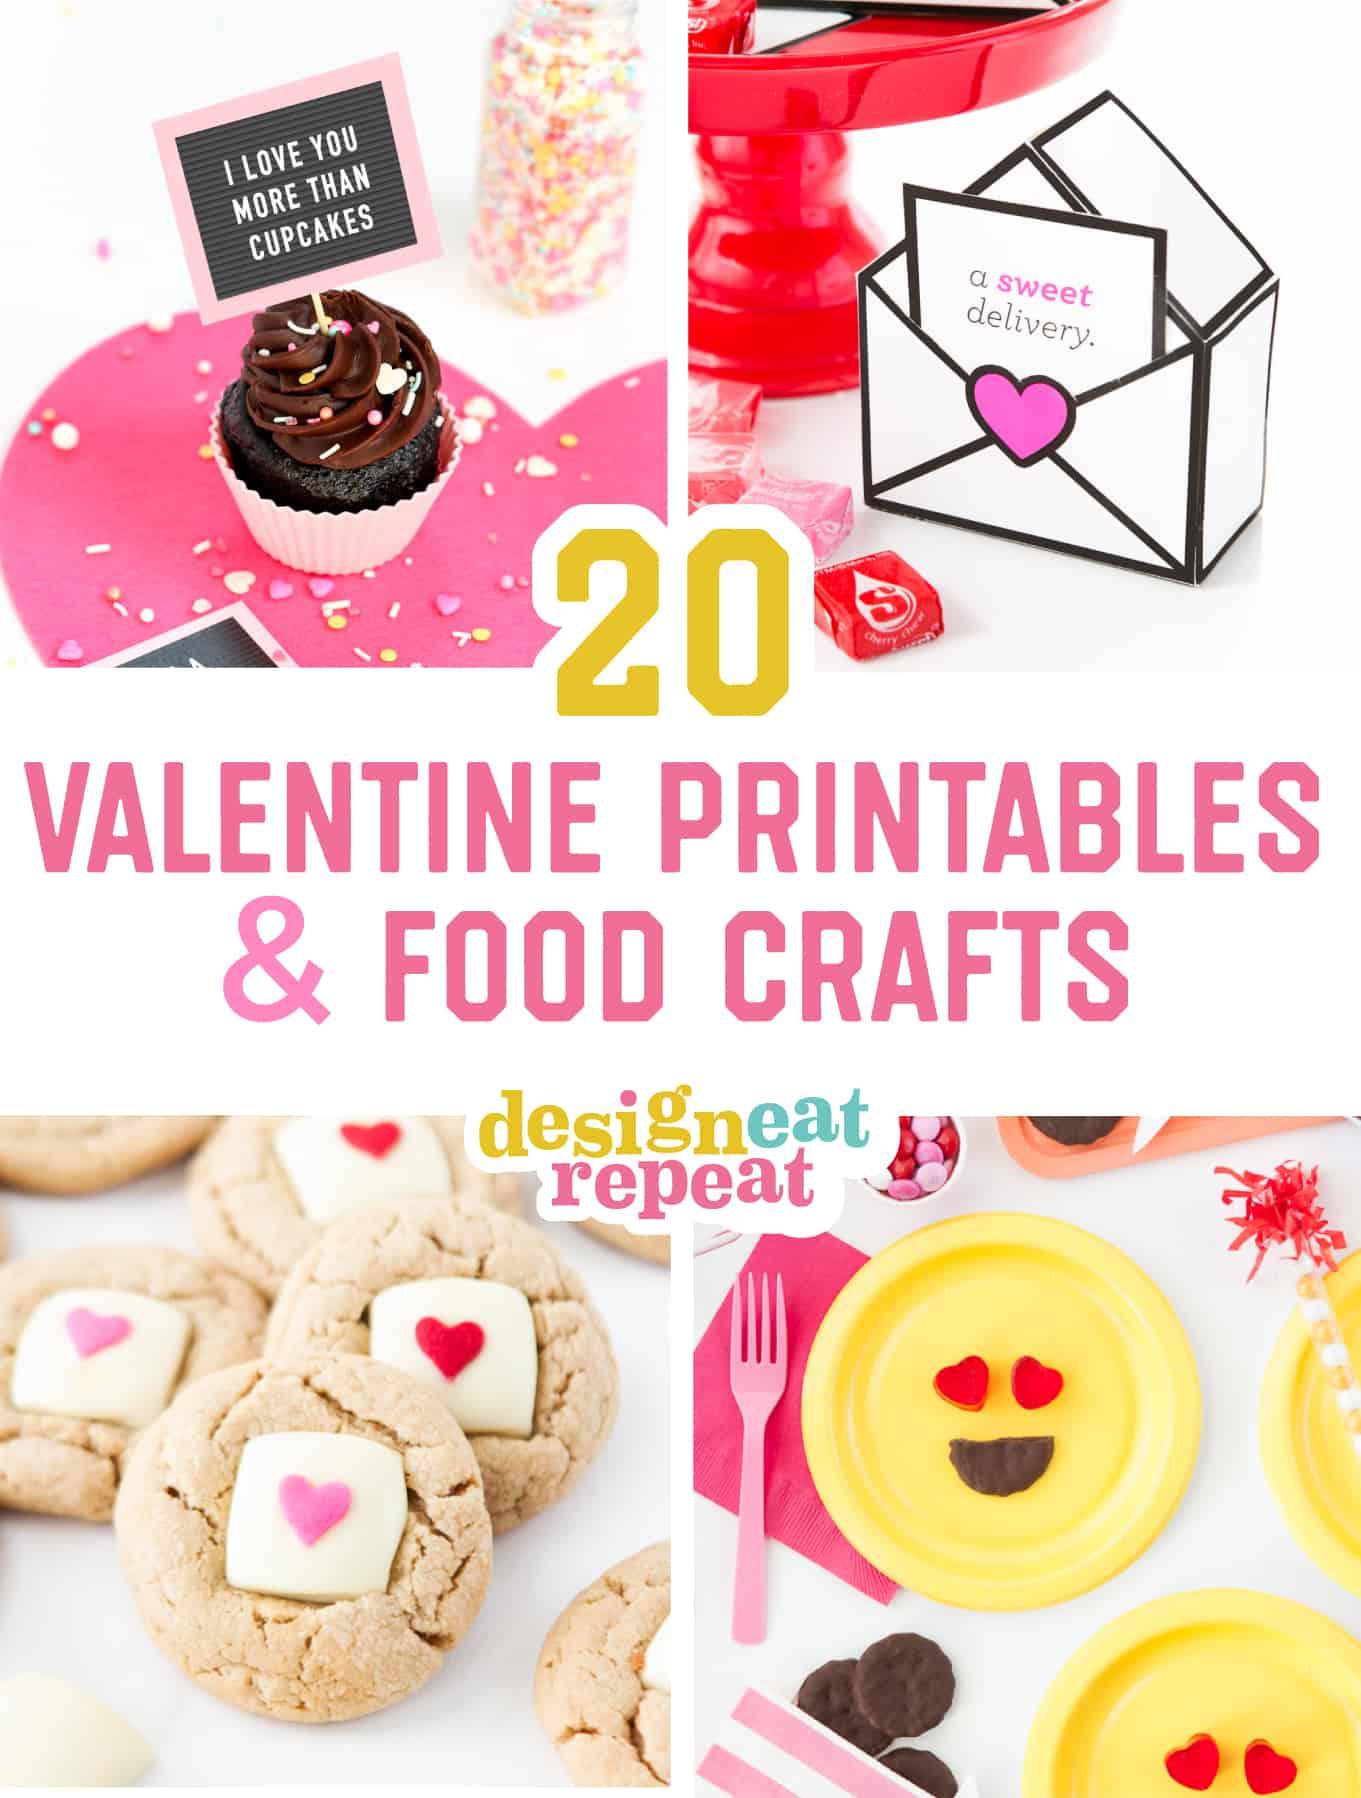 20 Easy Valentine Printables & Food Crafts